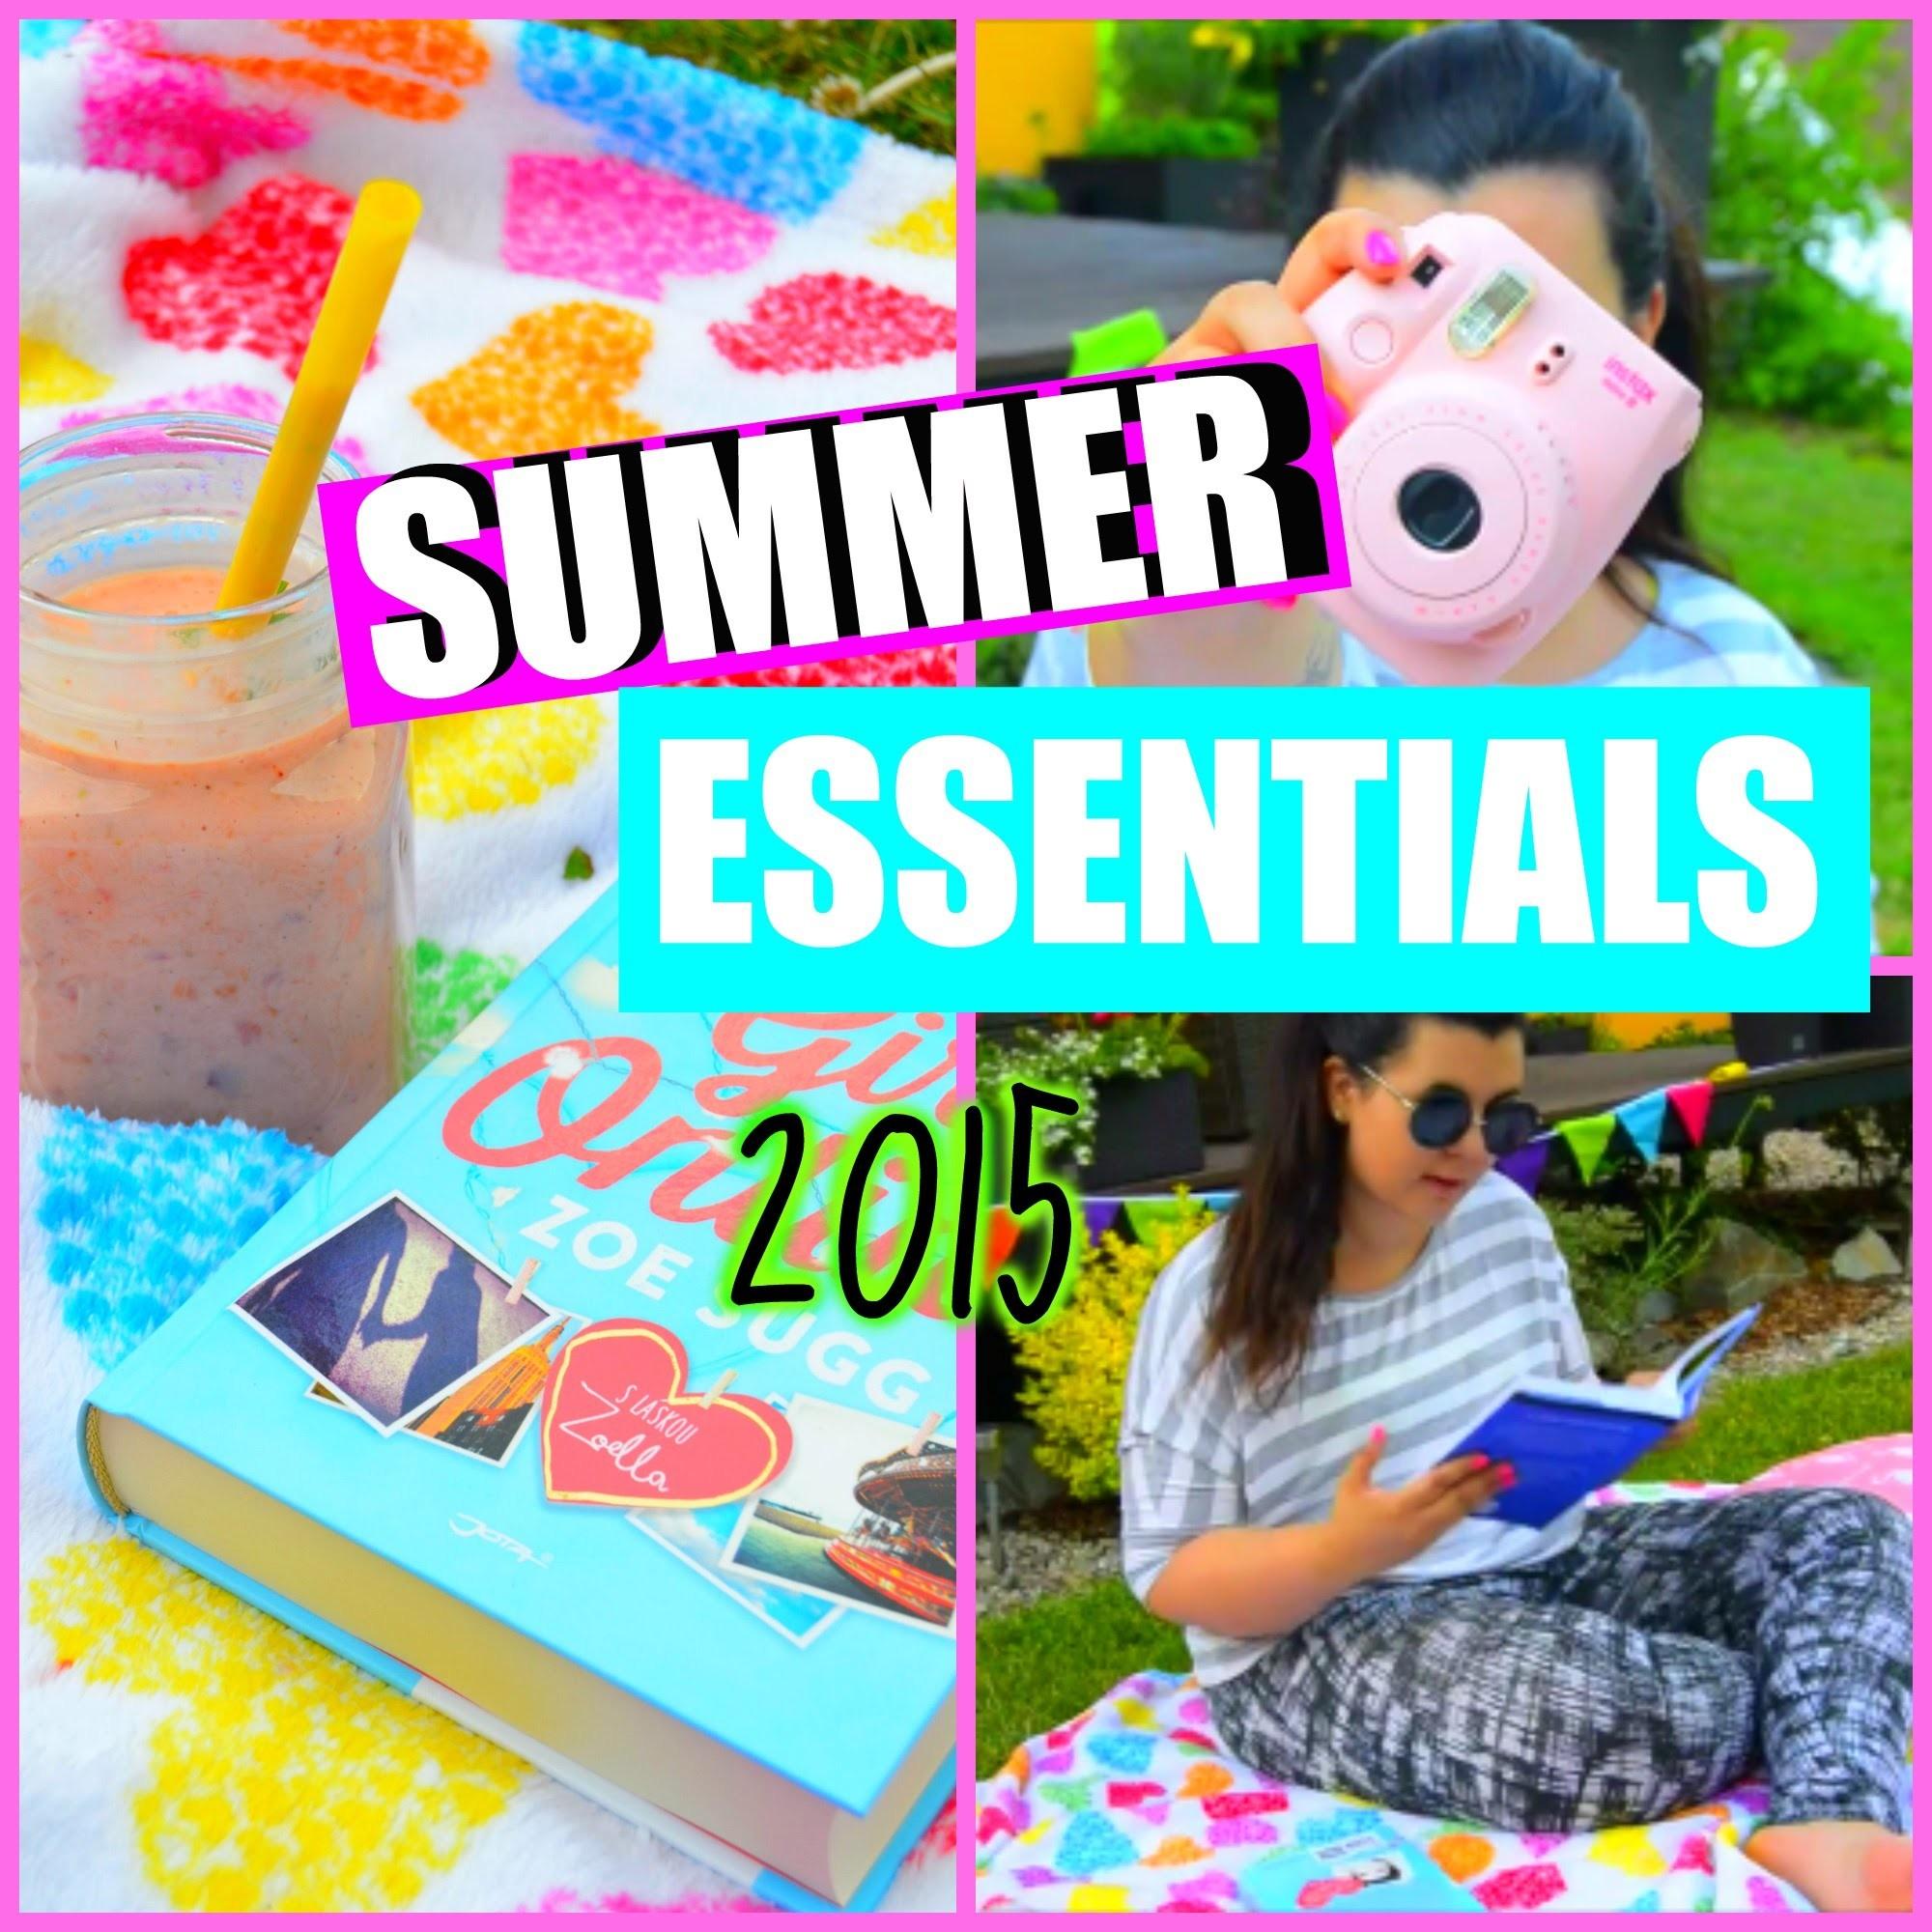 ♡ SUMMER ESSENTIALS - DIY, SNACK, PICNIC - Letní  inspirace ♡